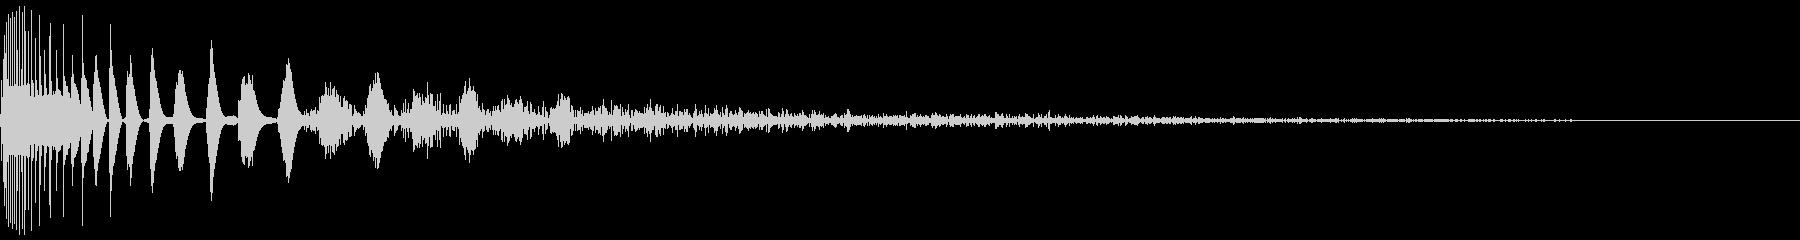 DTM Snare 7 オリジナル音源の未再生の波形